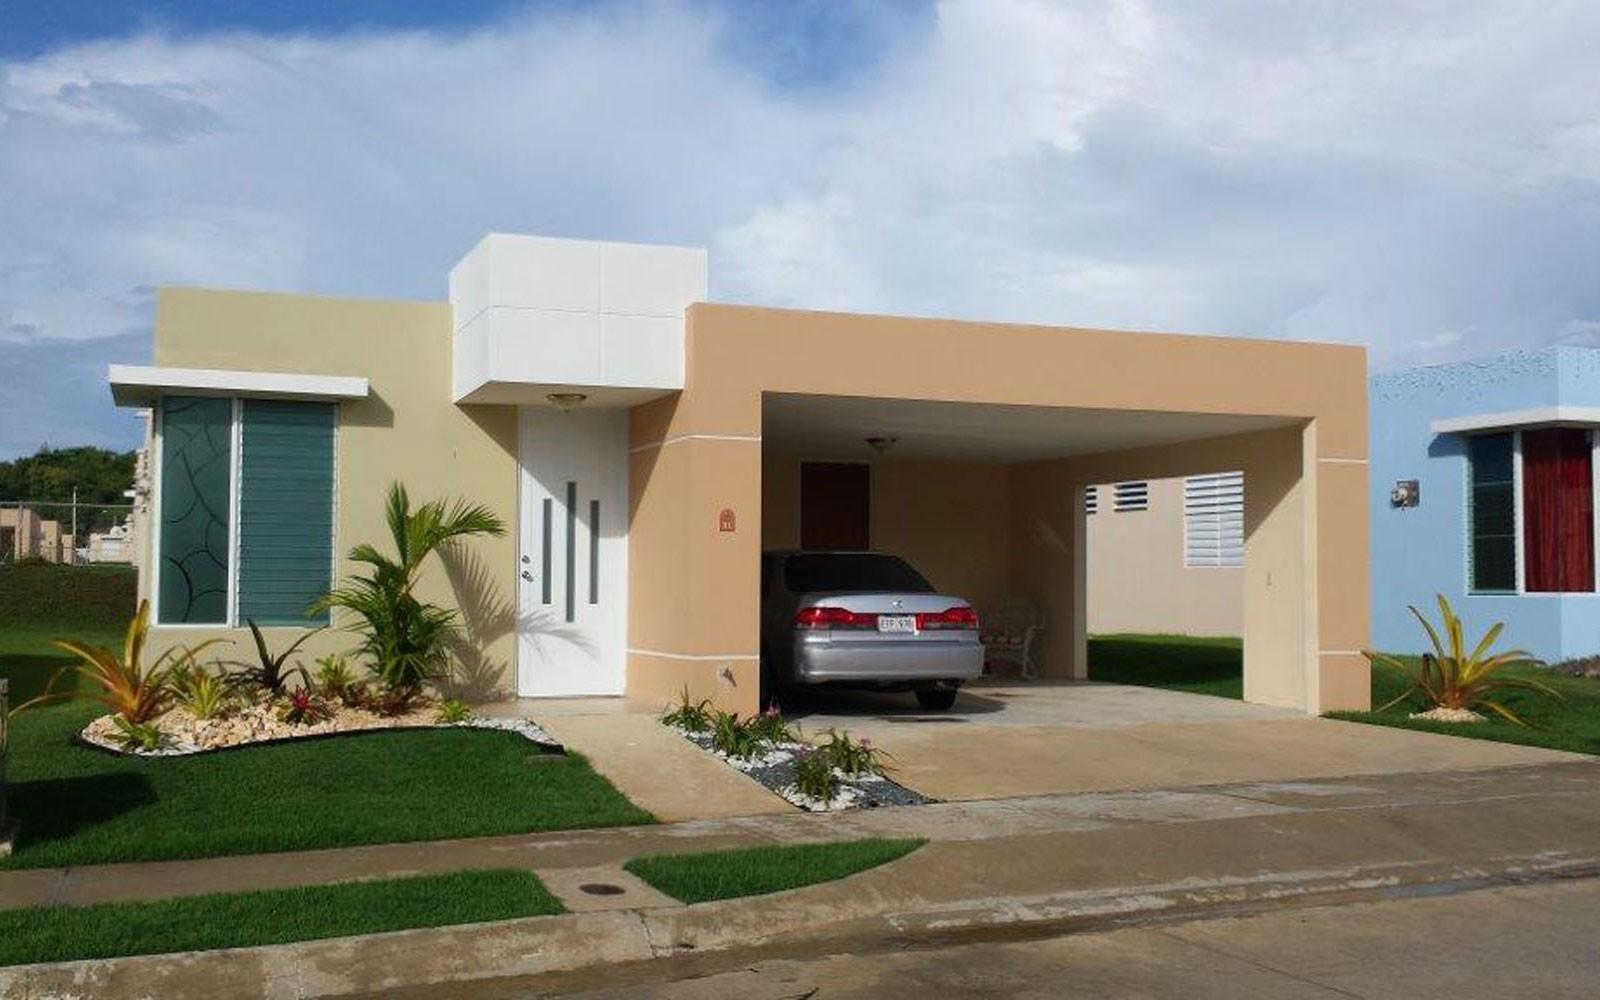 Casa verde rental housing casas rio grande puerto rico for Alquiler de casas baratas en sevilla este